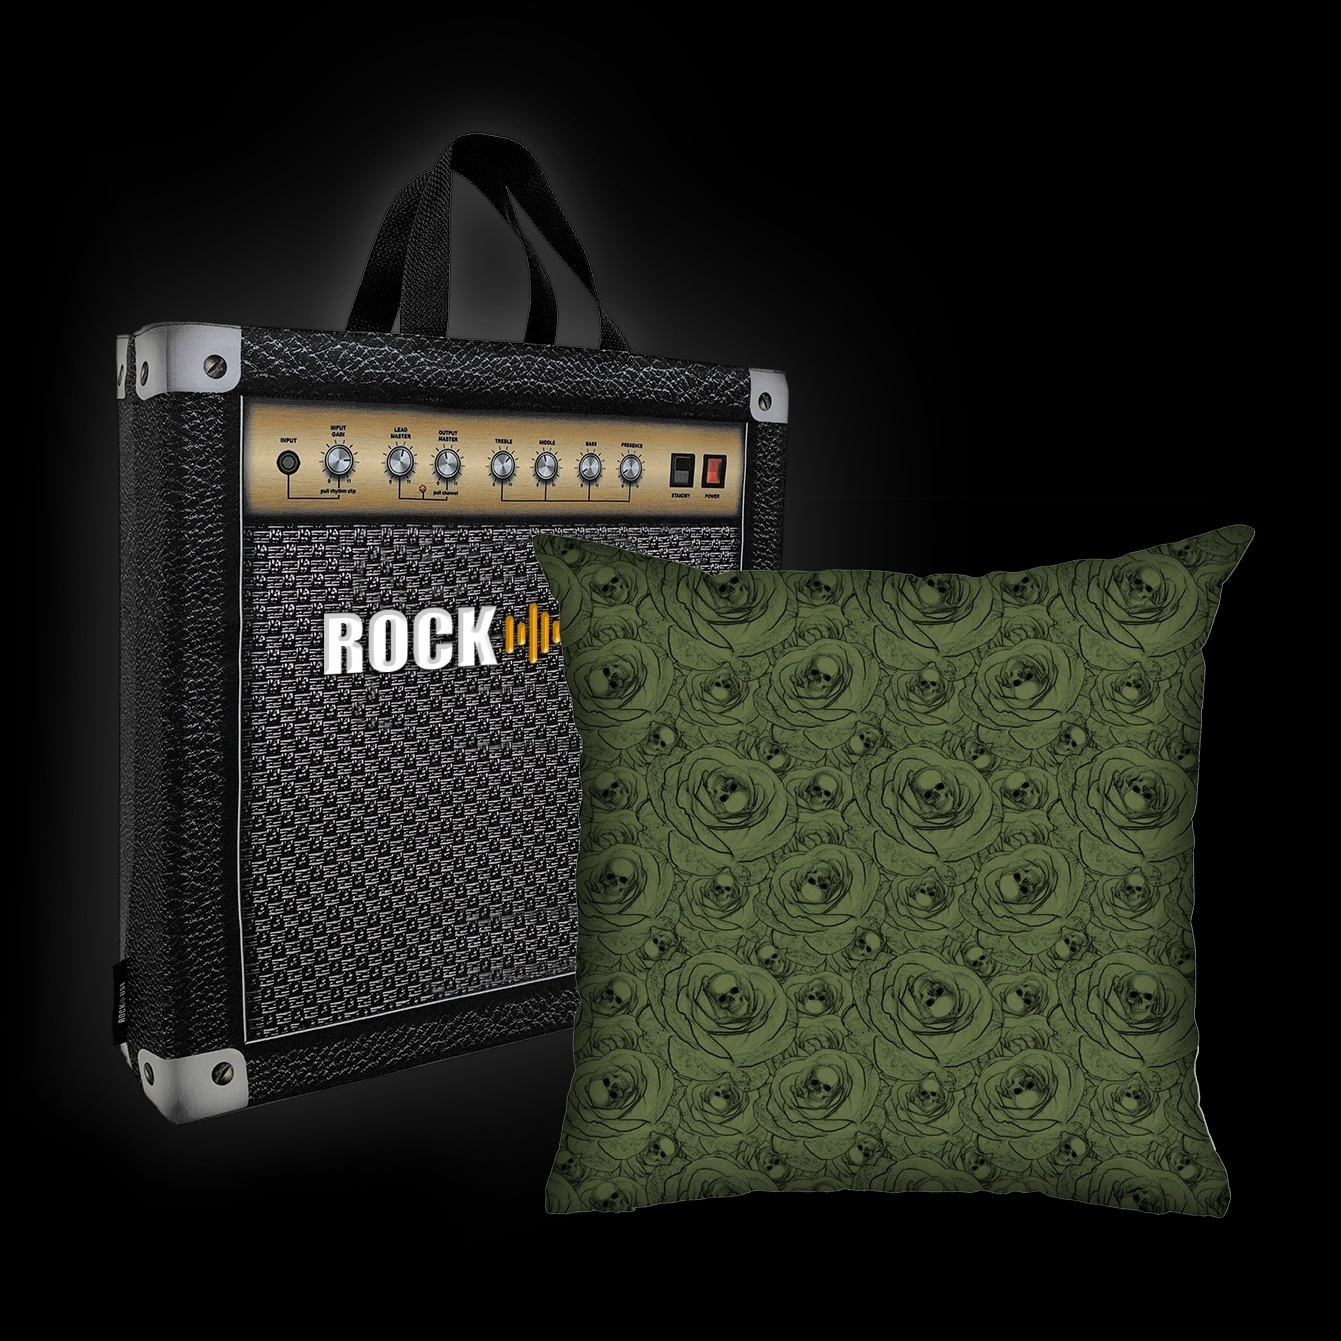 Kit Almofada & Sacola Rock Use - Skull & Roses - Verde